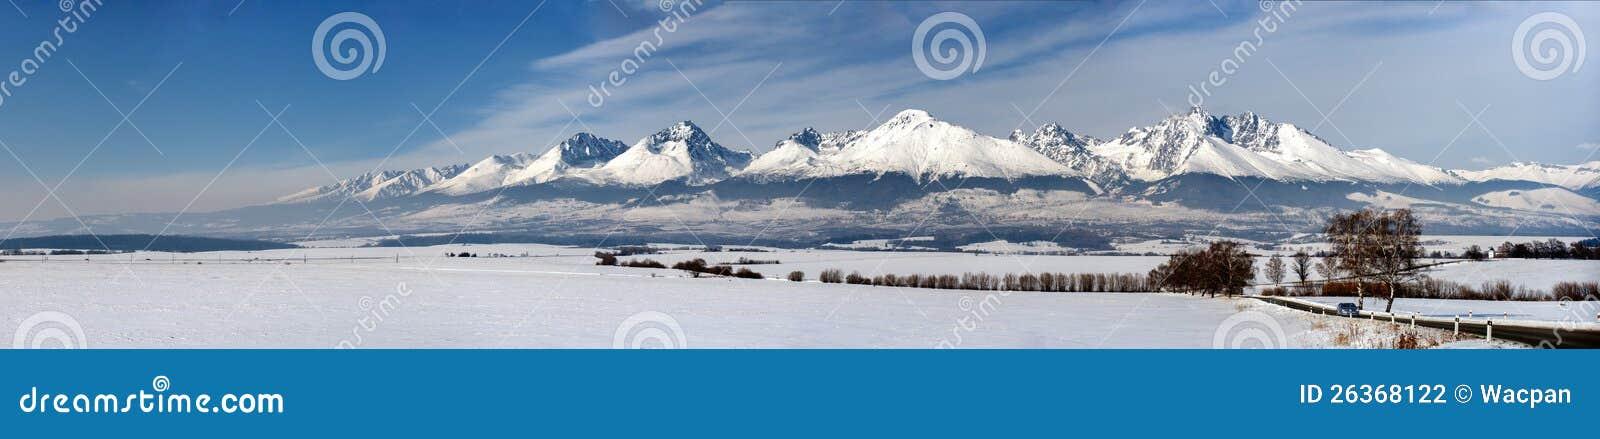 Winterpanorama der hohen tatry Berge